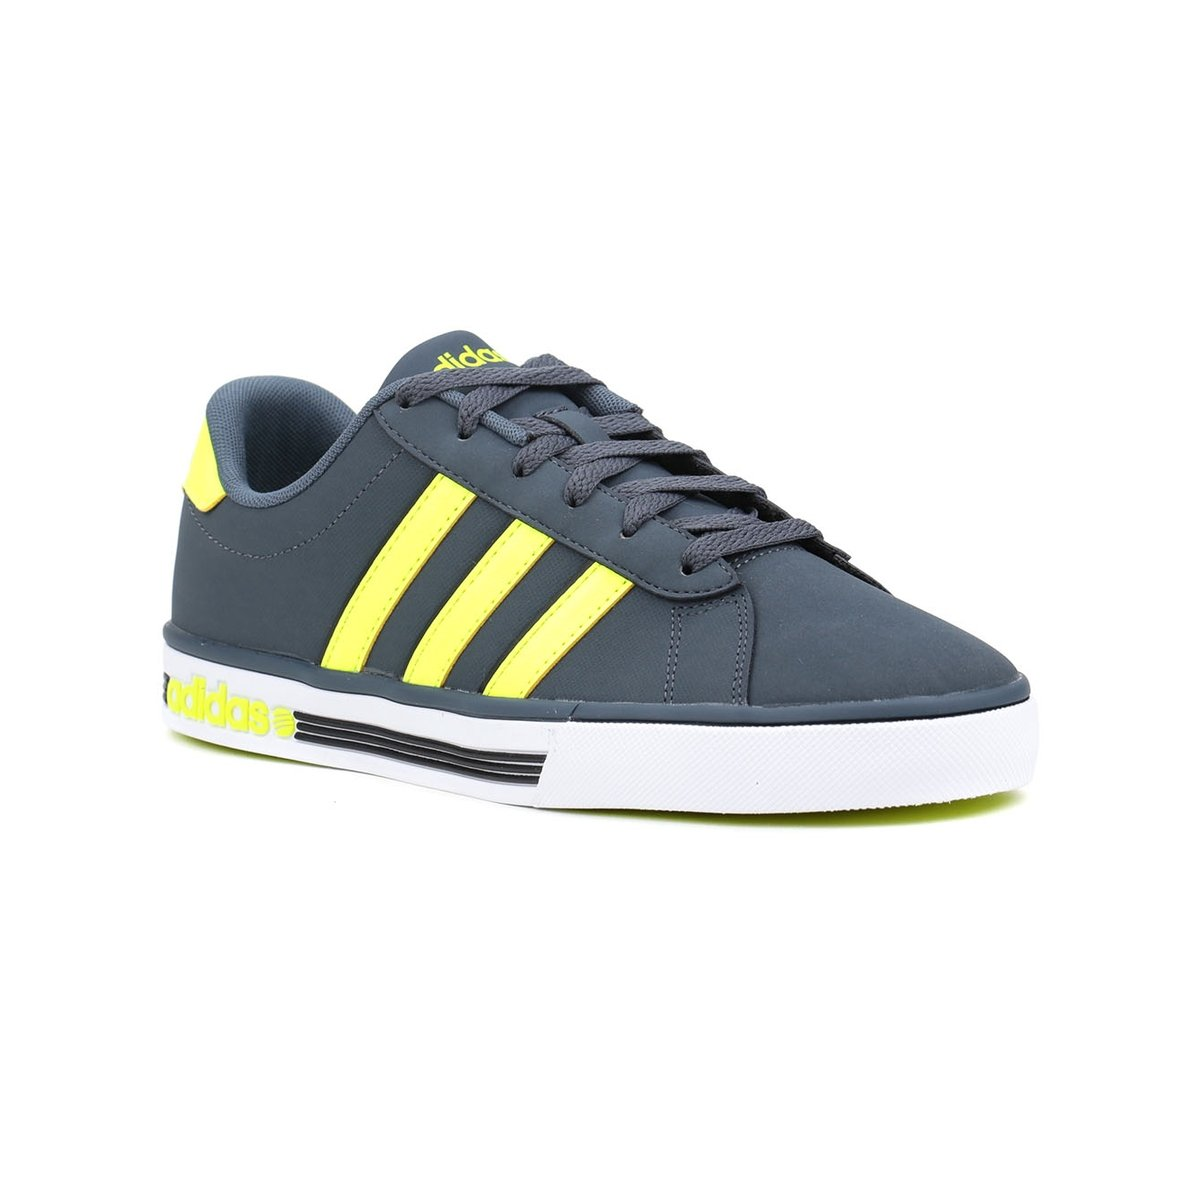 ff35b6b8cff Tênis Casual Adidas Daily Team Adidas - Compre Agora